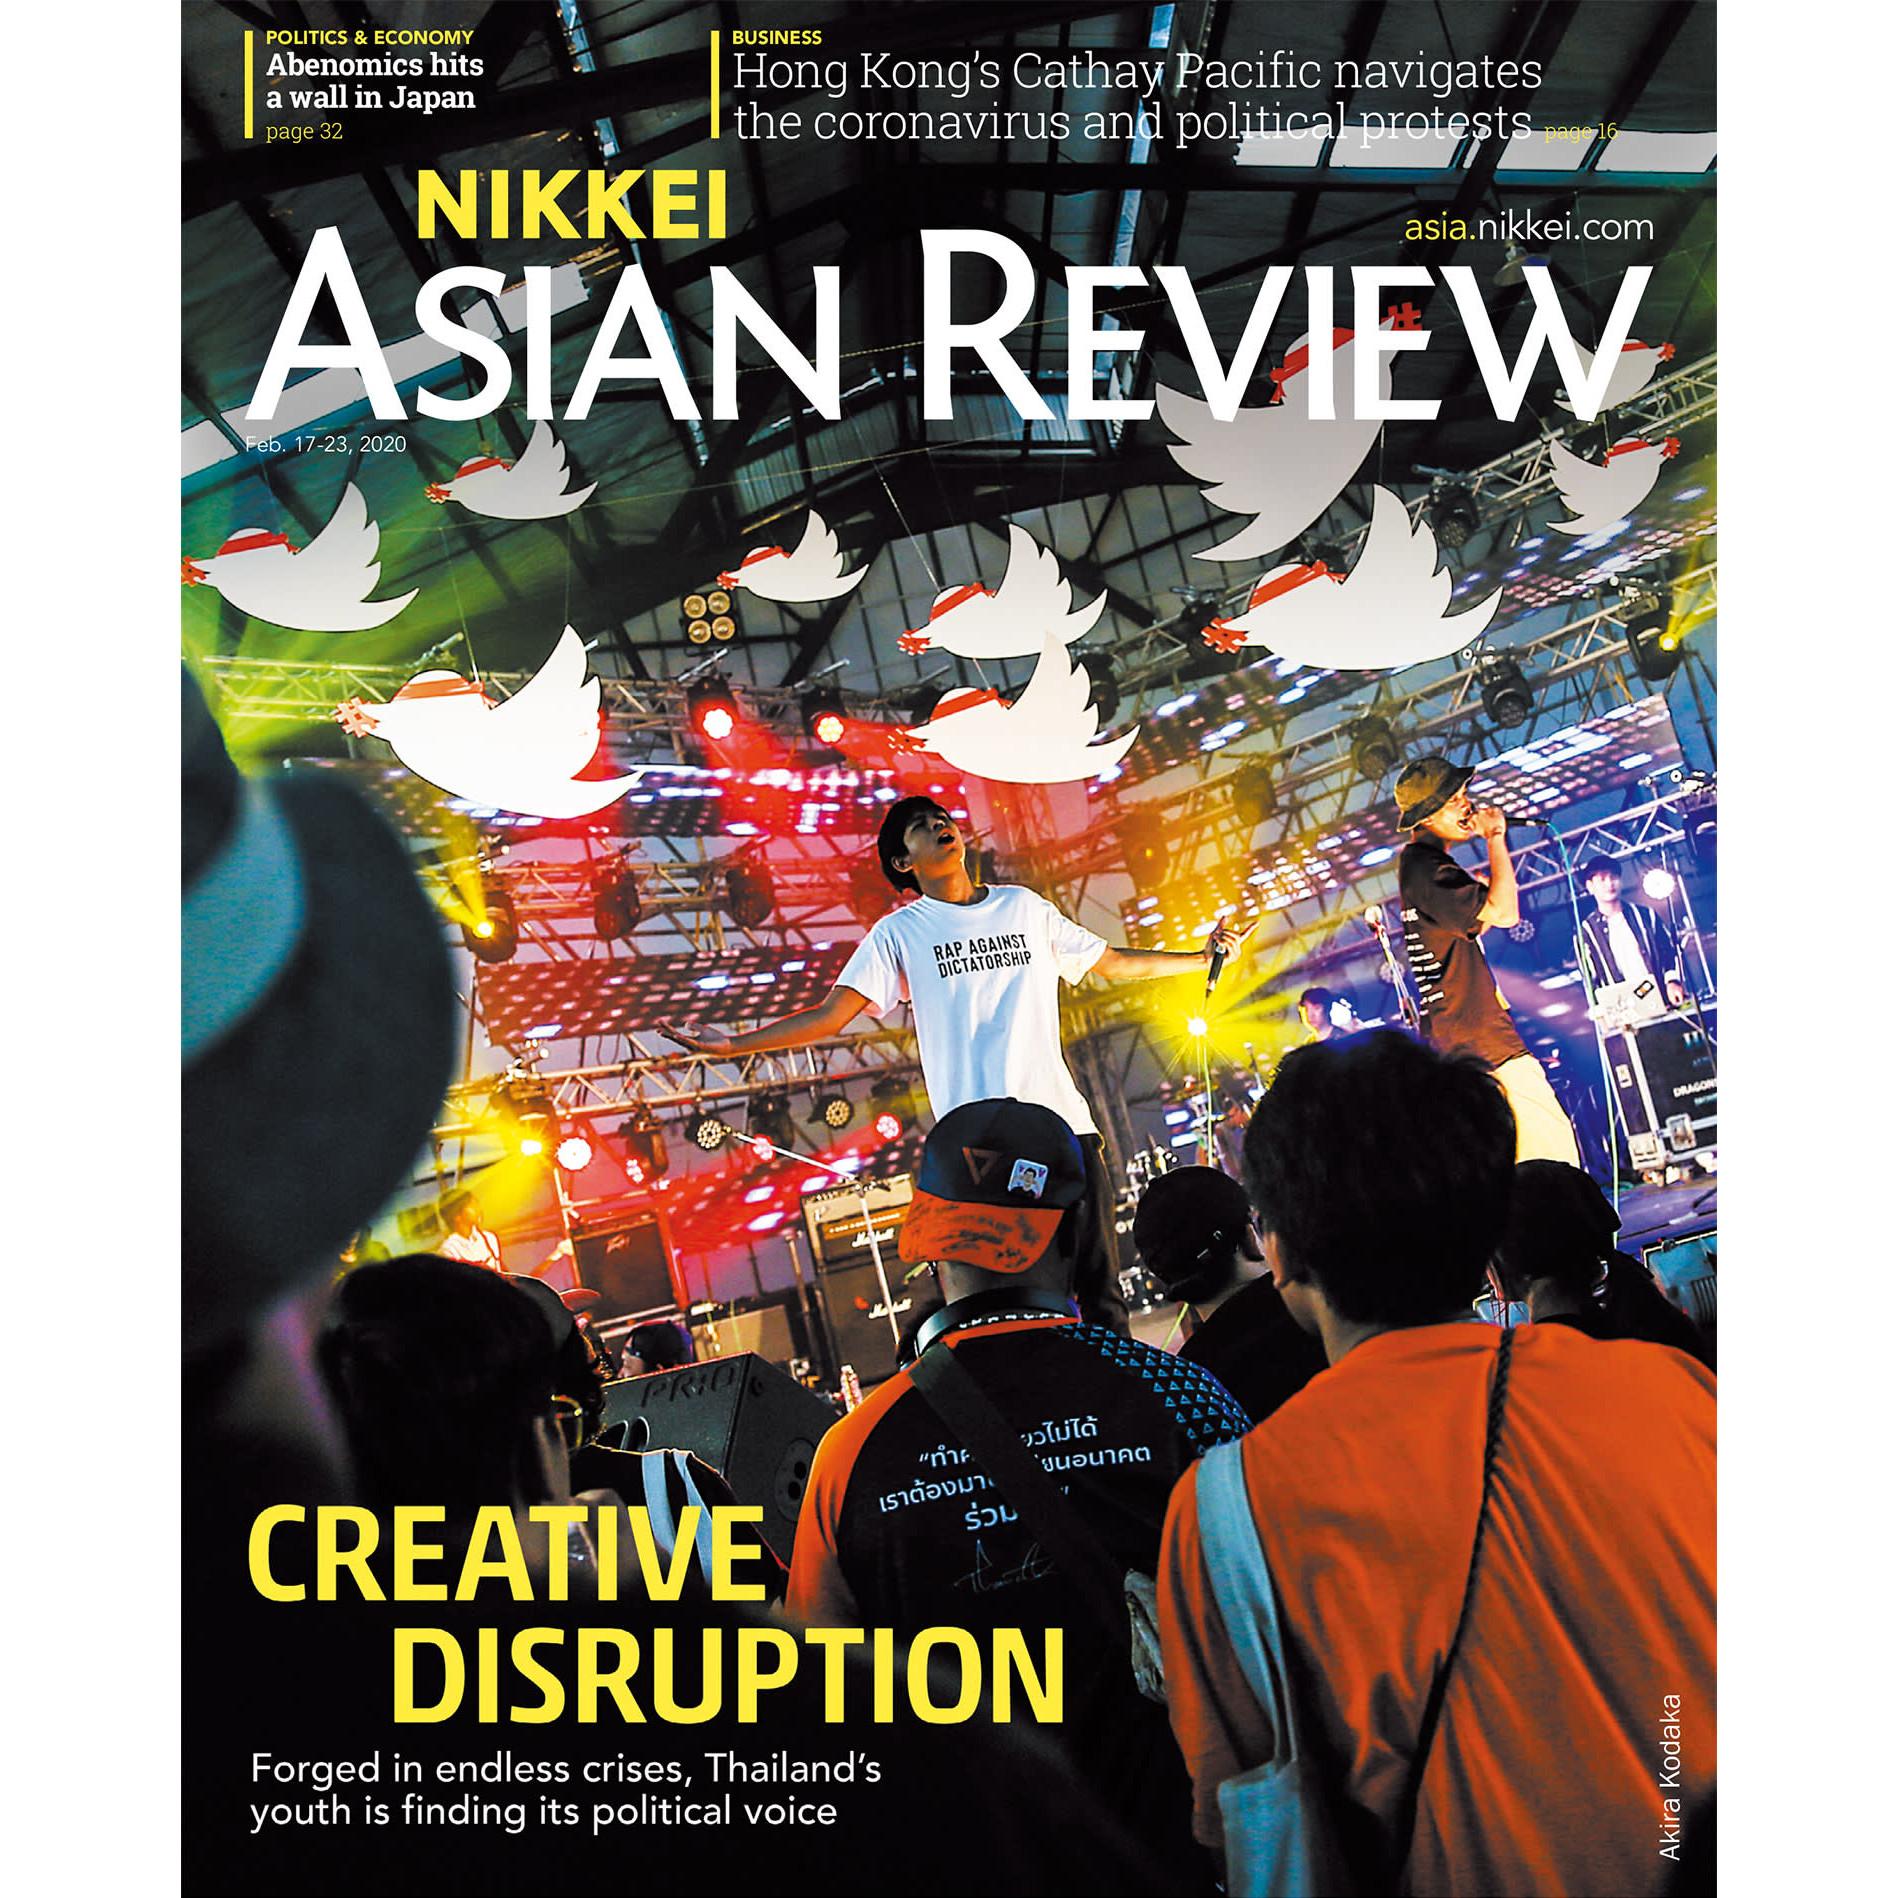 Nikkei Asian Review: Creative Discruption - 07.20